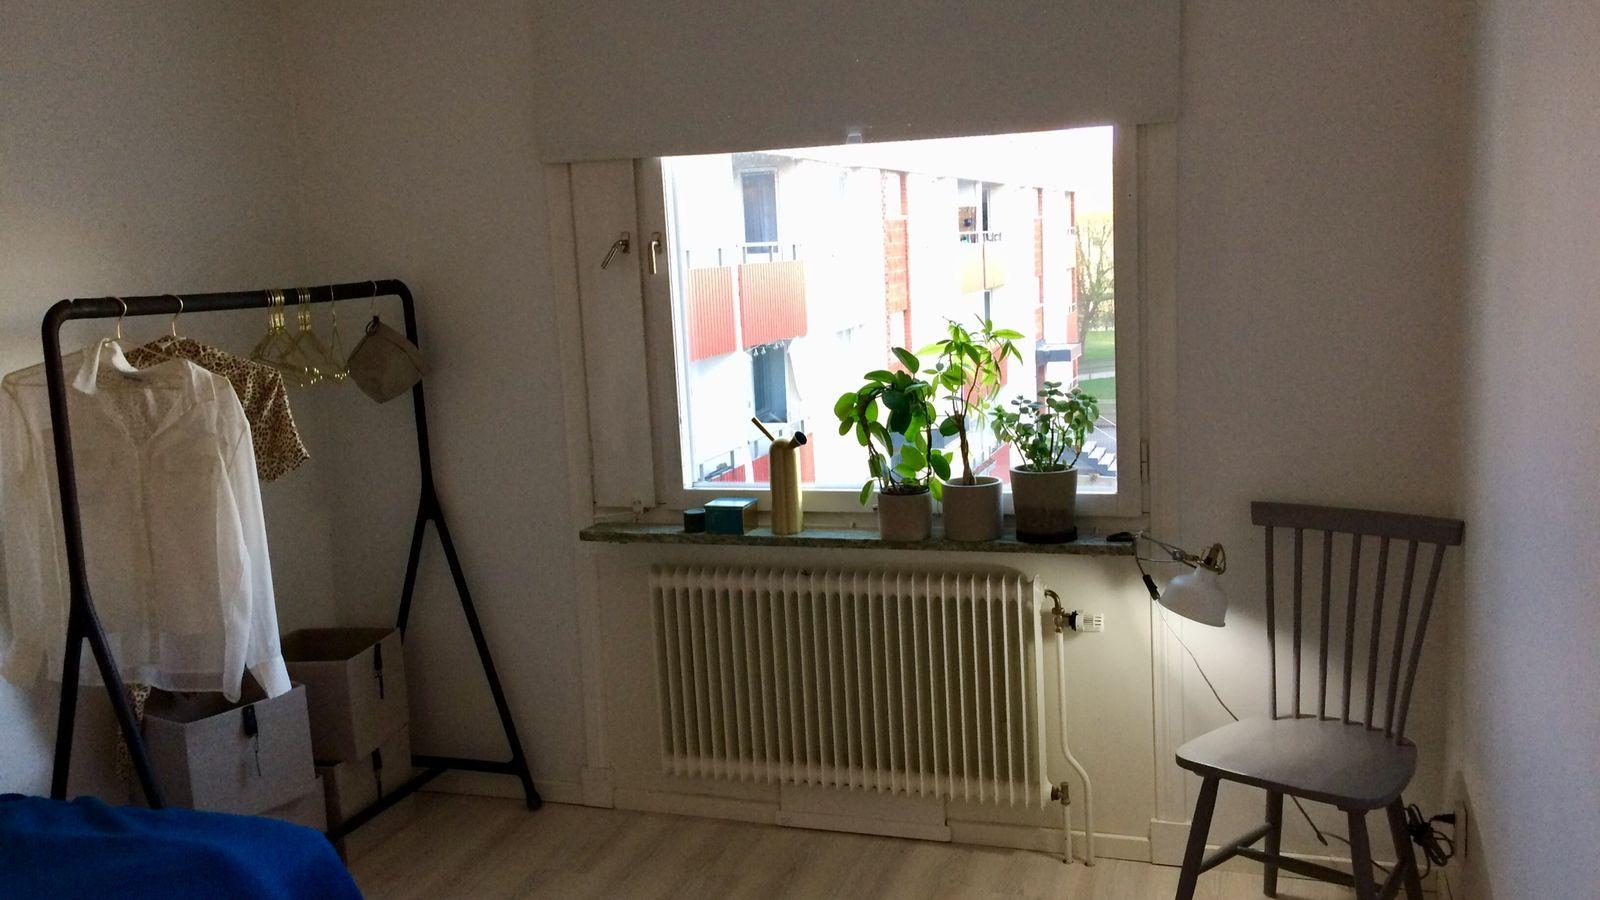 Ledig lägenhet i Skövde